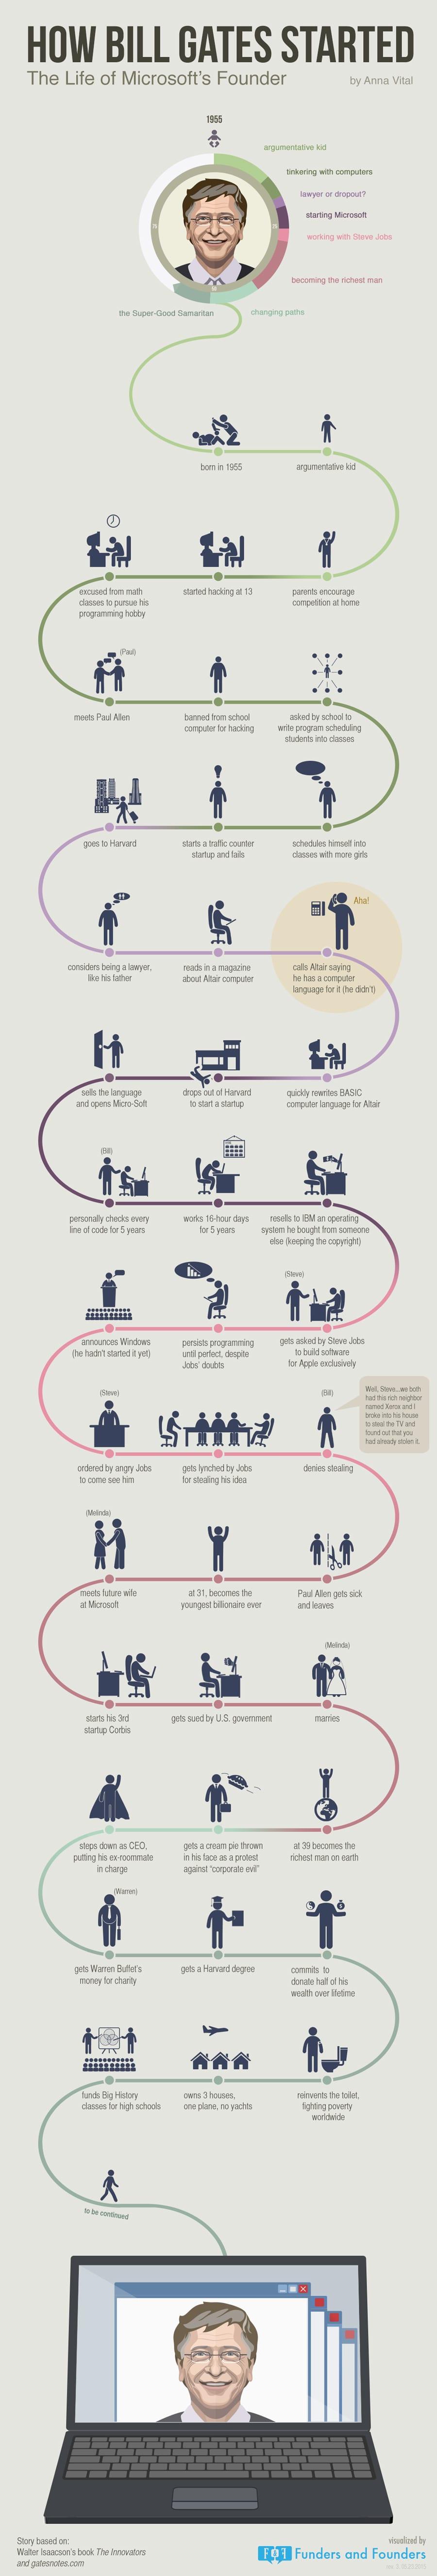 Bill Gates infographic